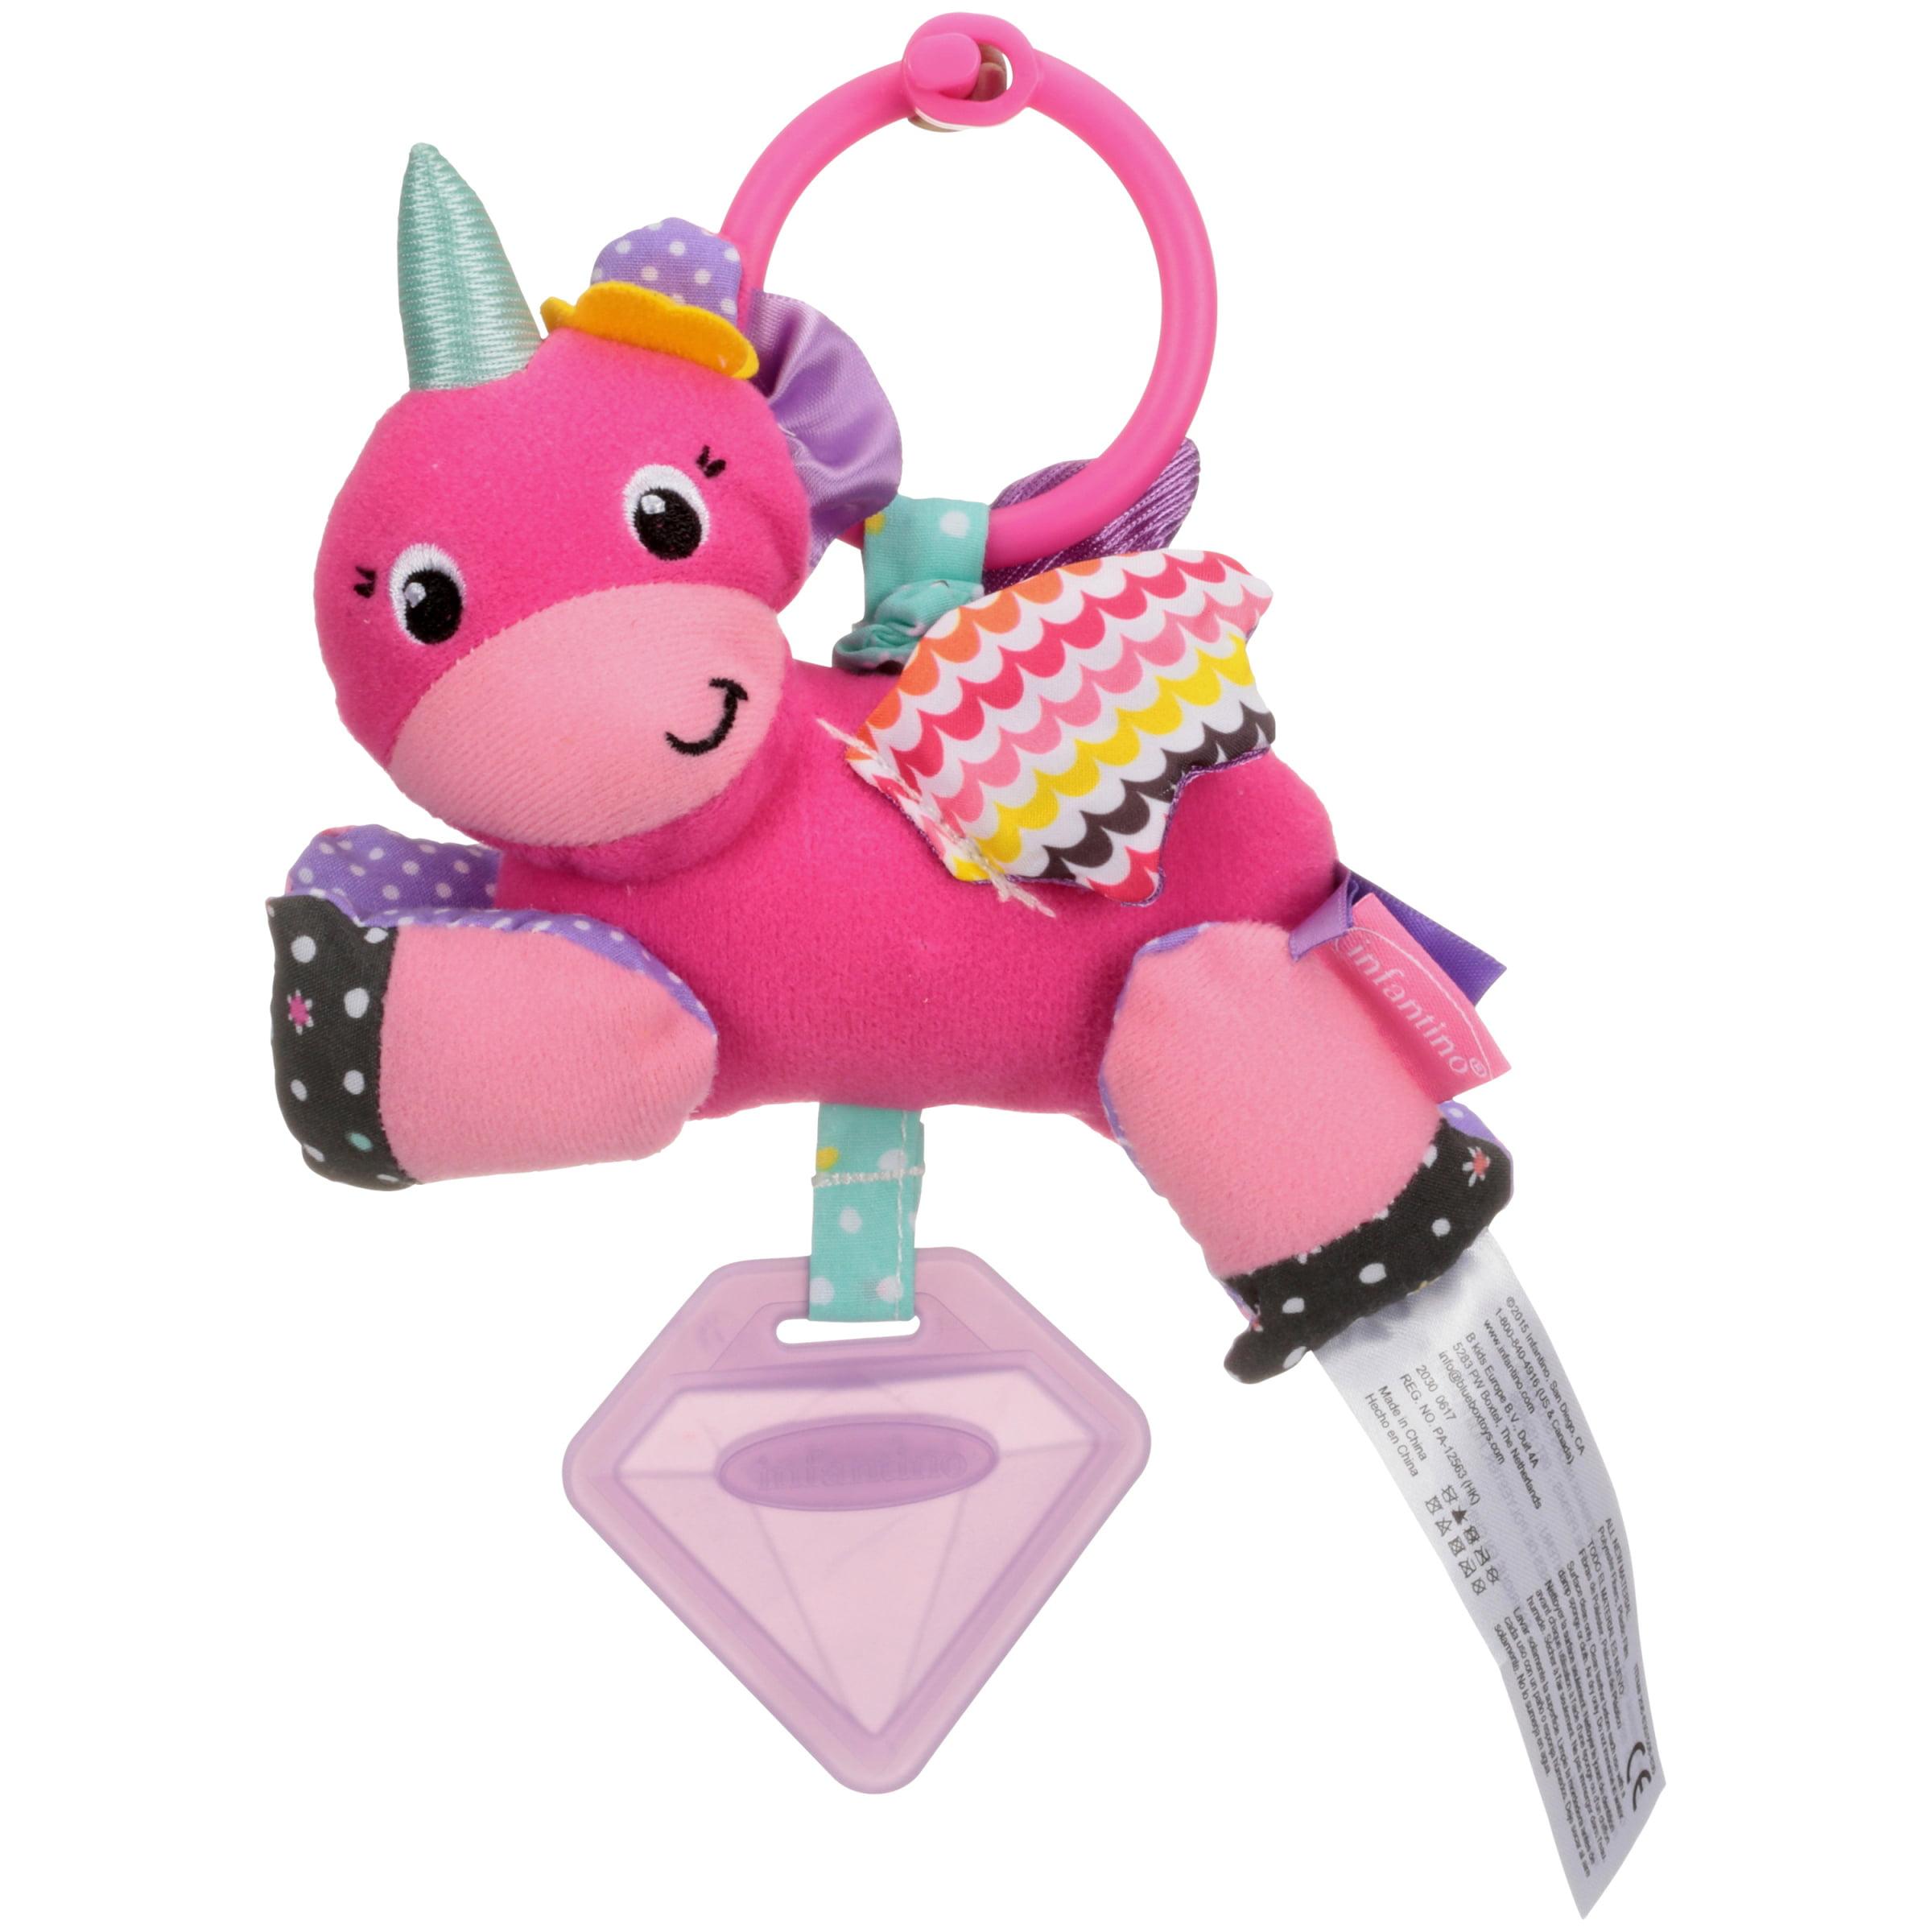 Infantino Sparkle Jinglin' Gem Jittery Pal by Infantino